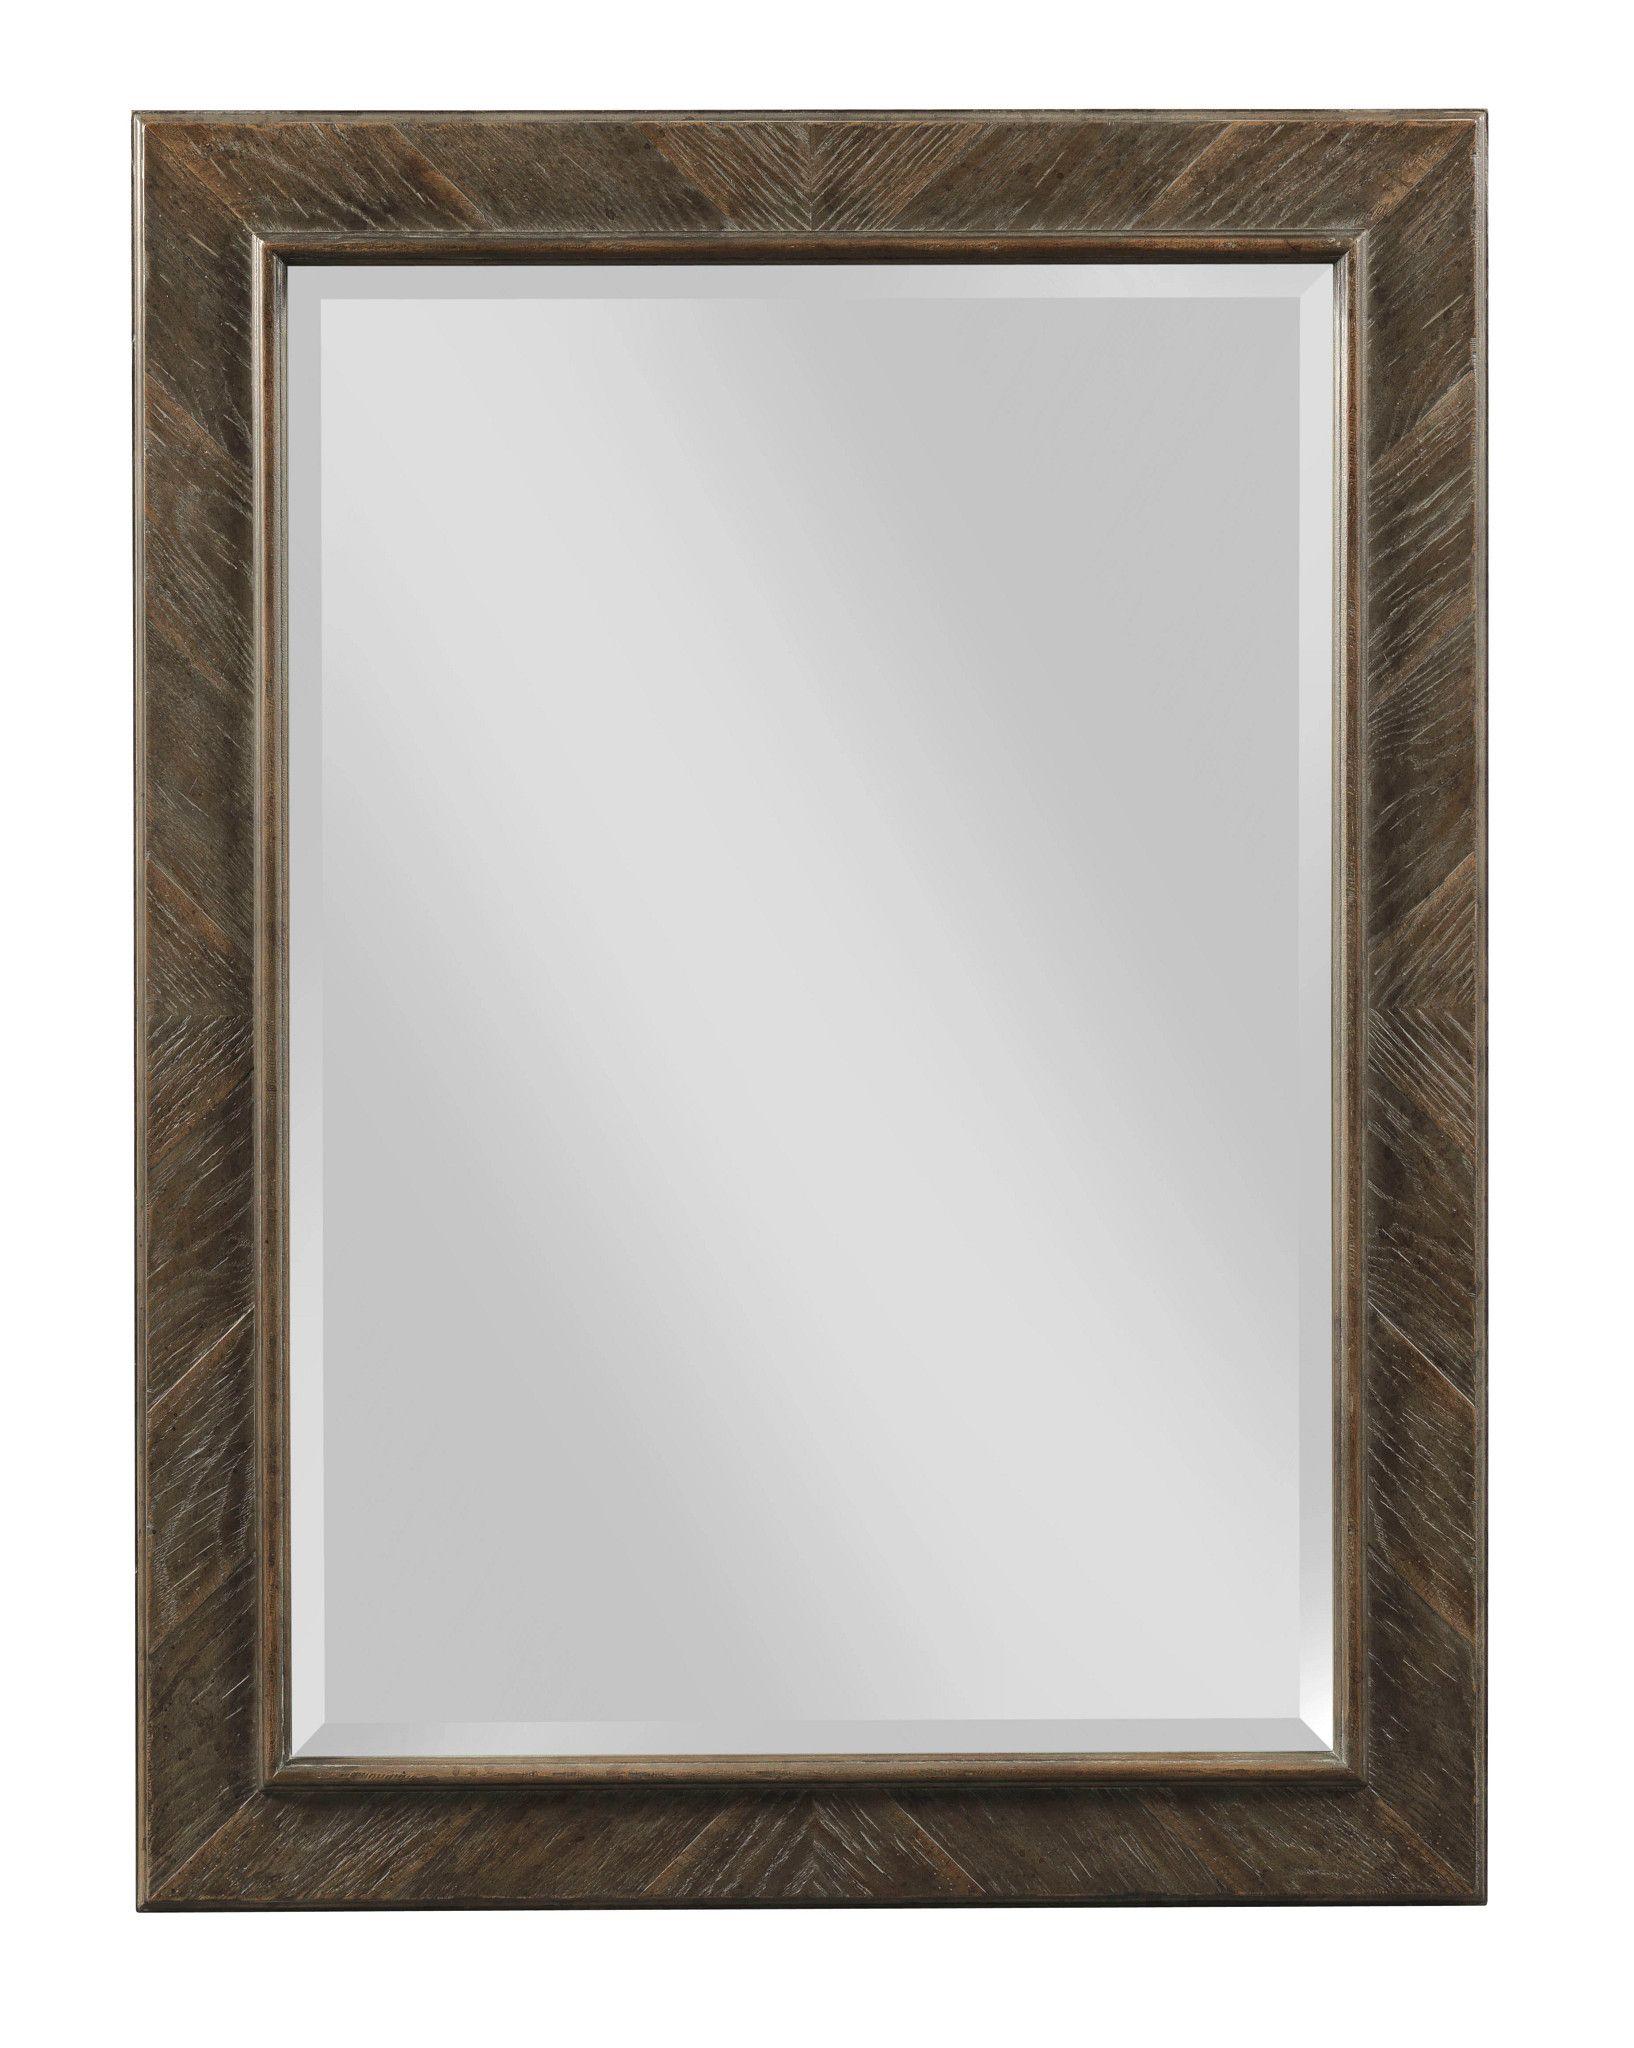 Emporium Mirror by American Drew at Esprit Decor Home Furnishings